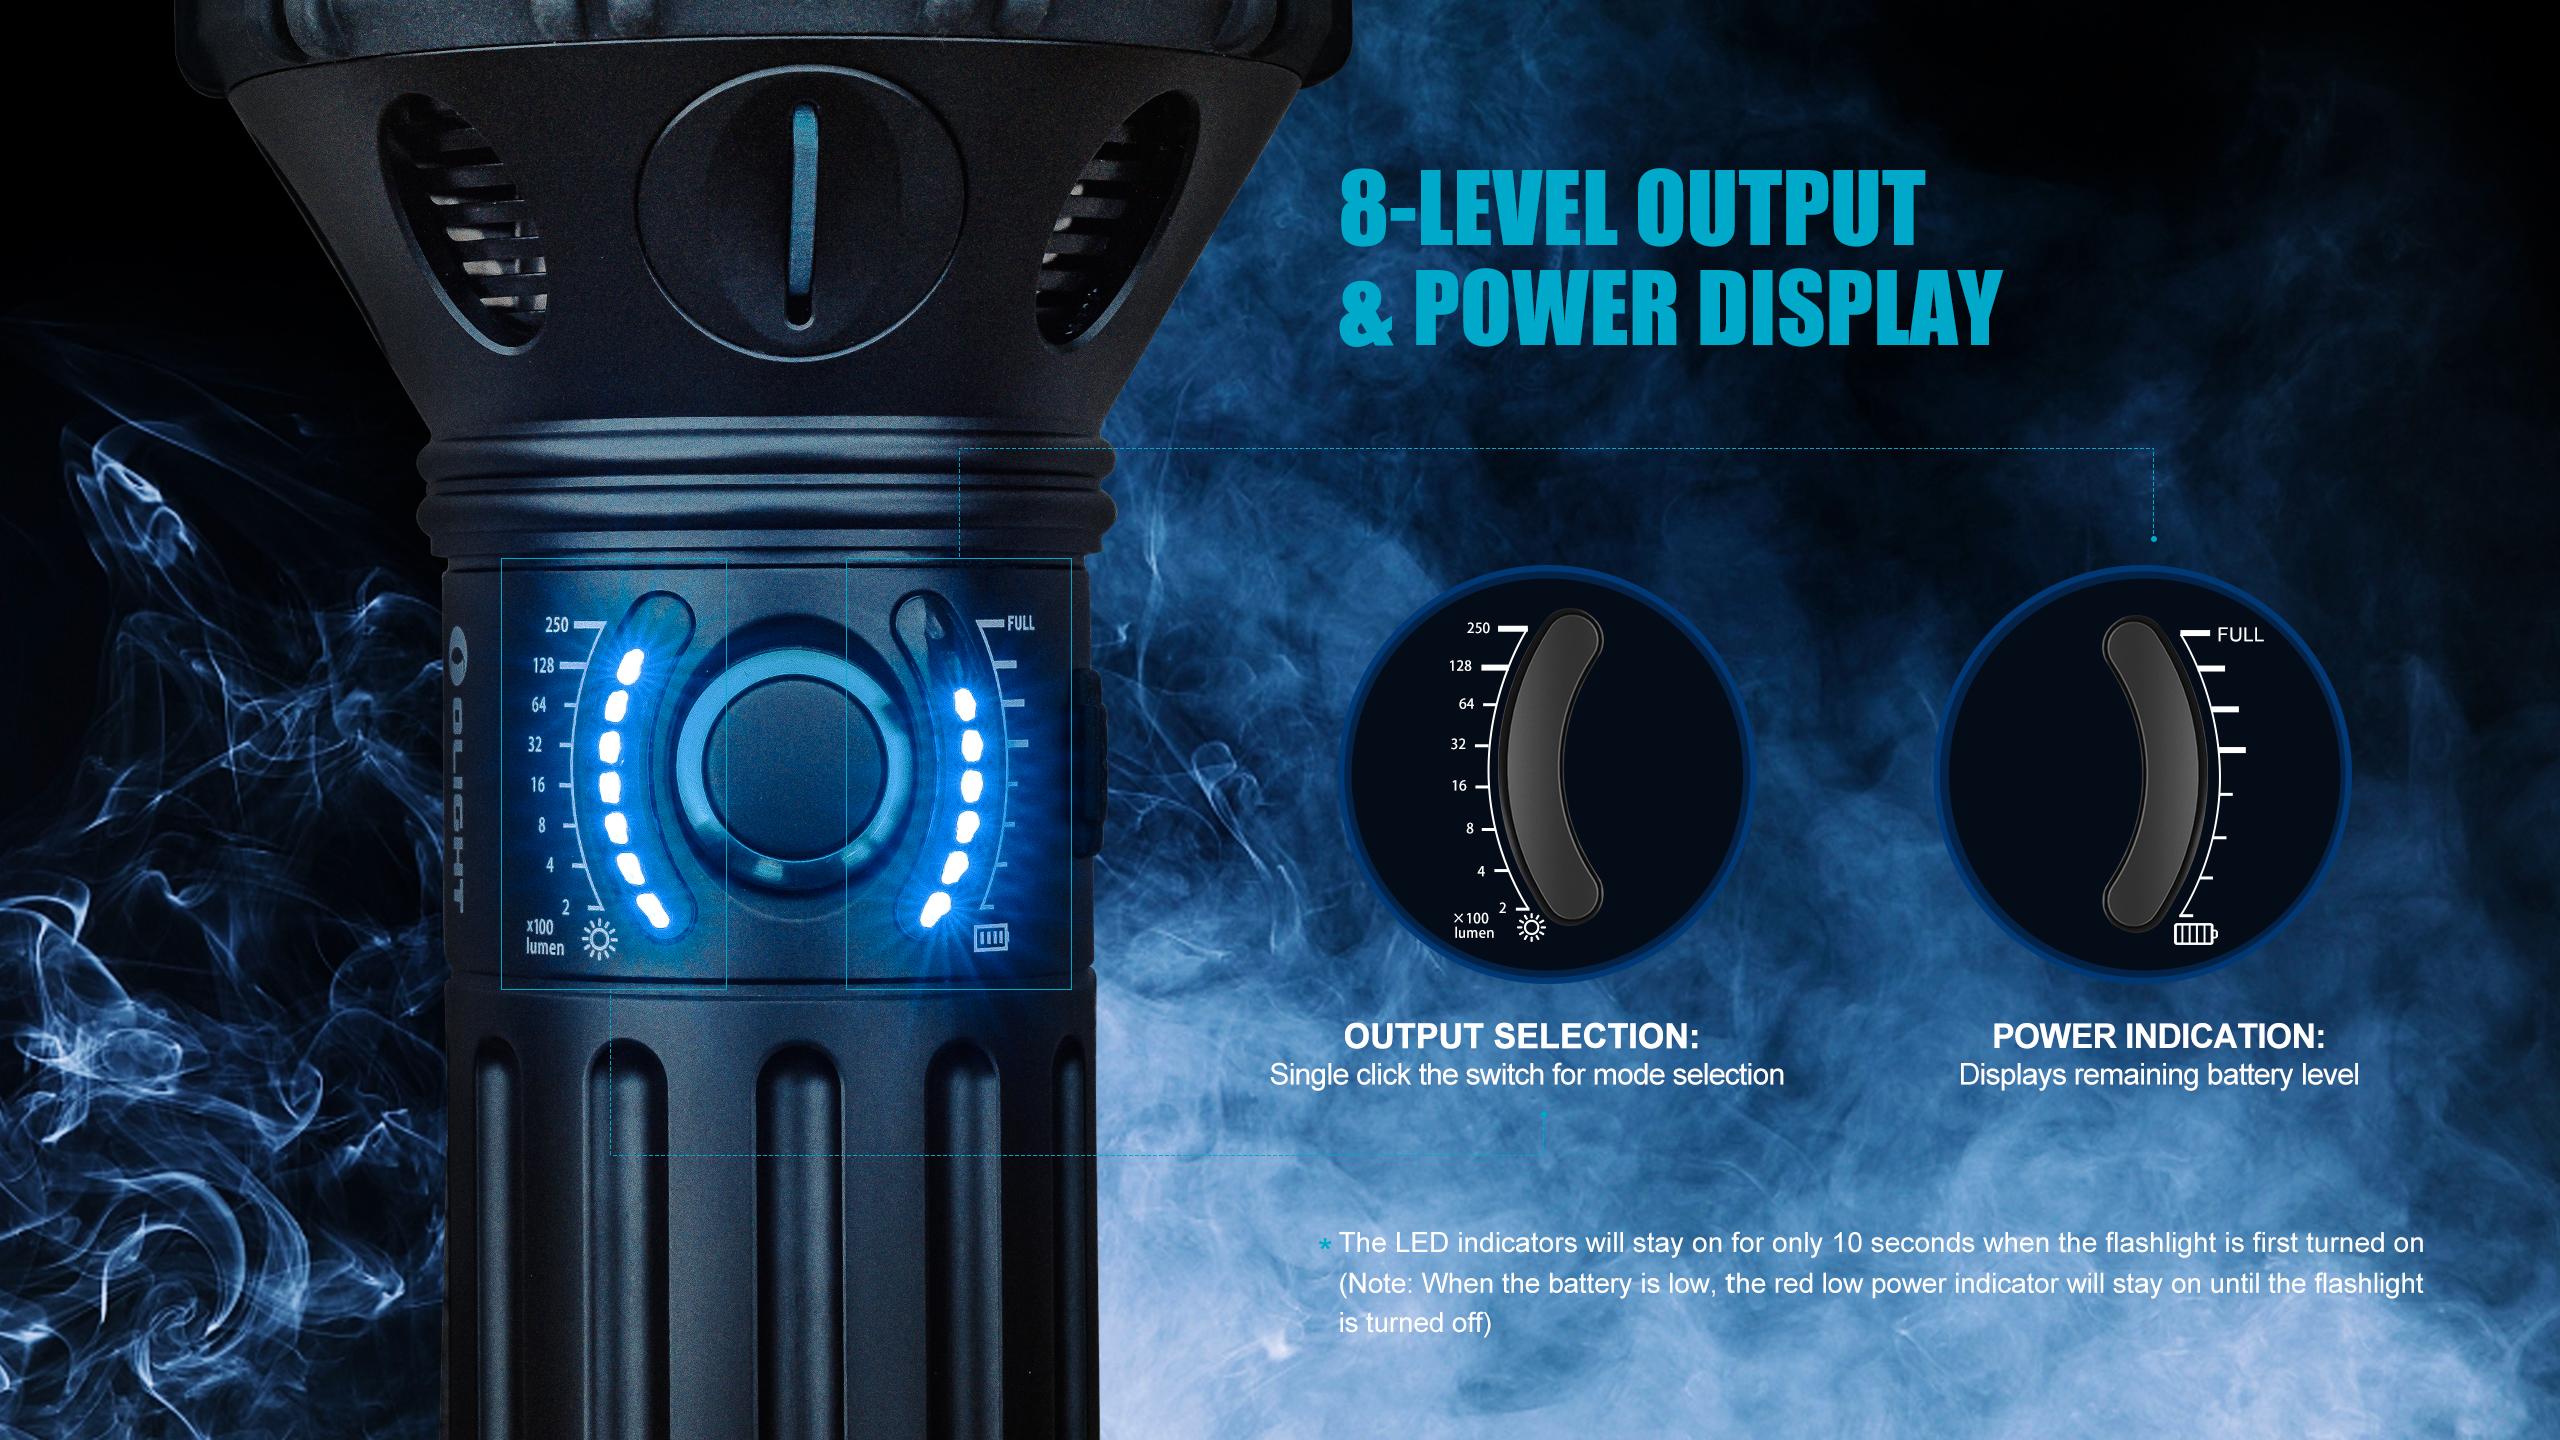 X9R Brightest Flashlight 8-level output